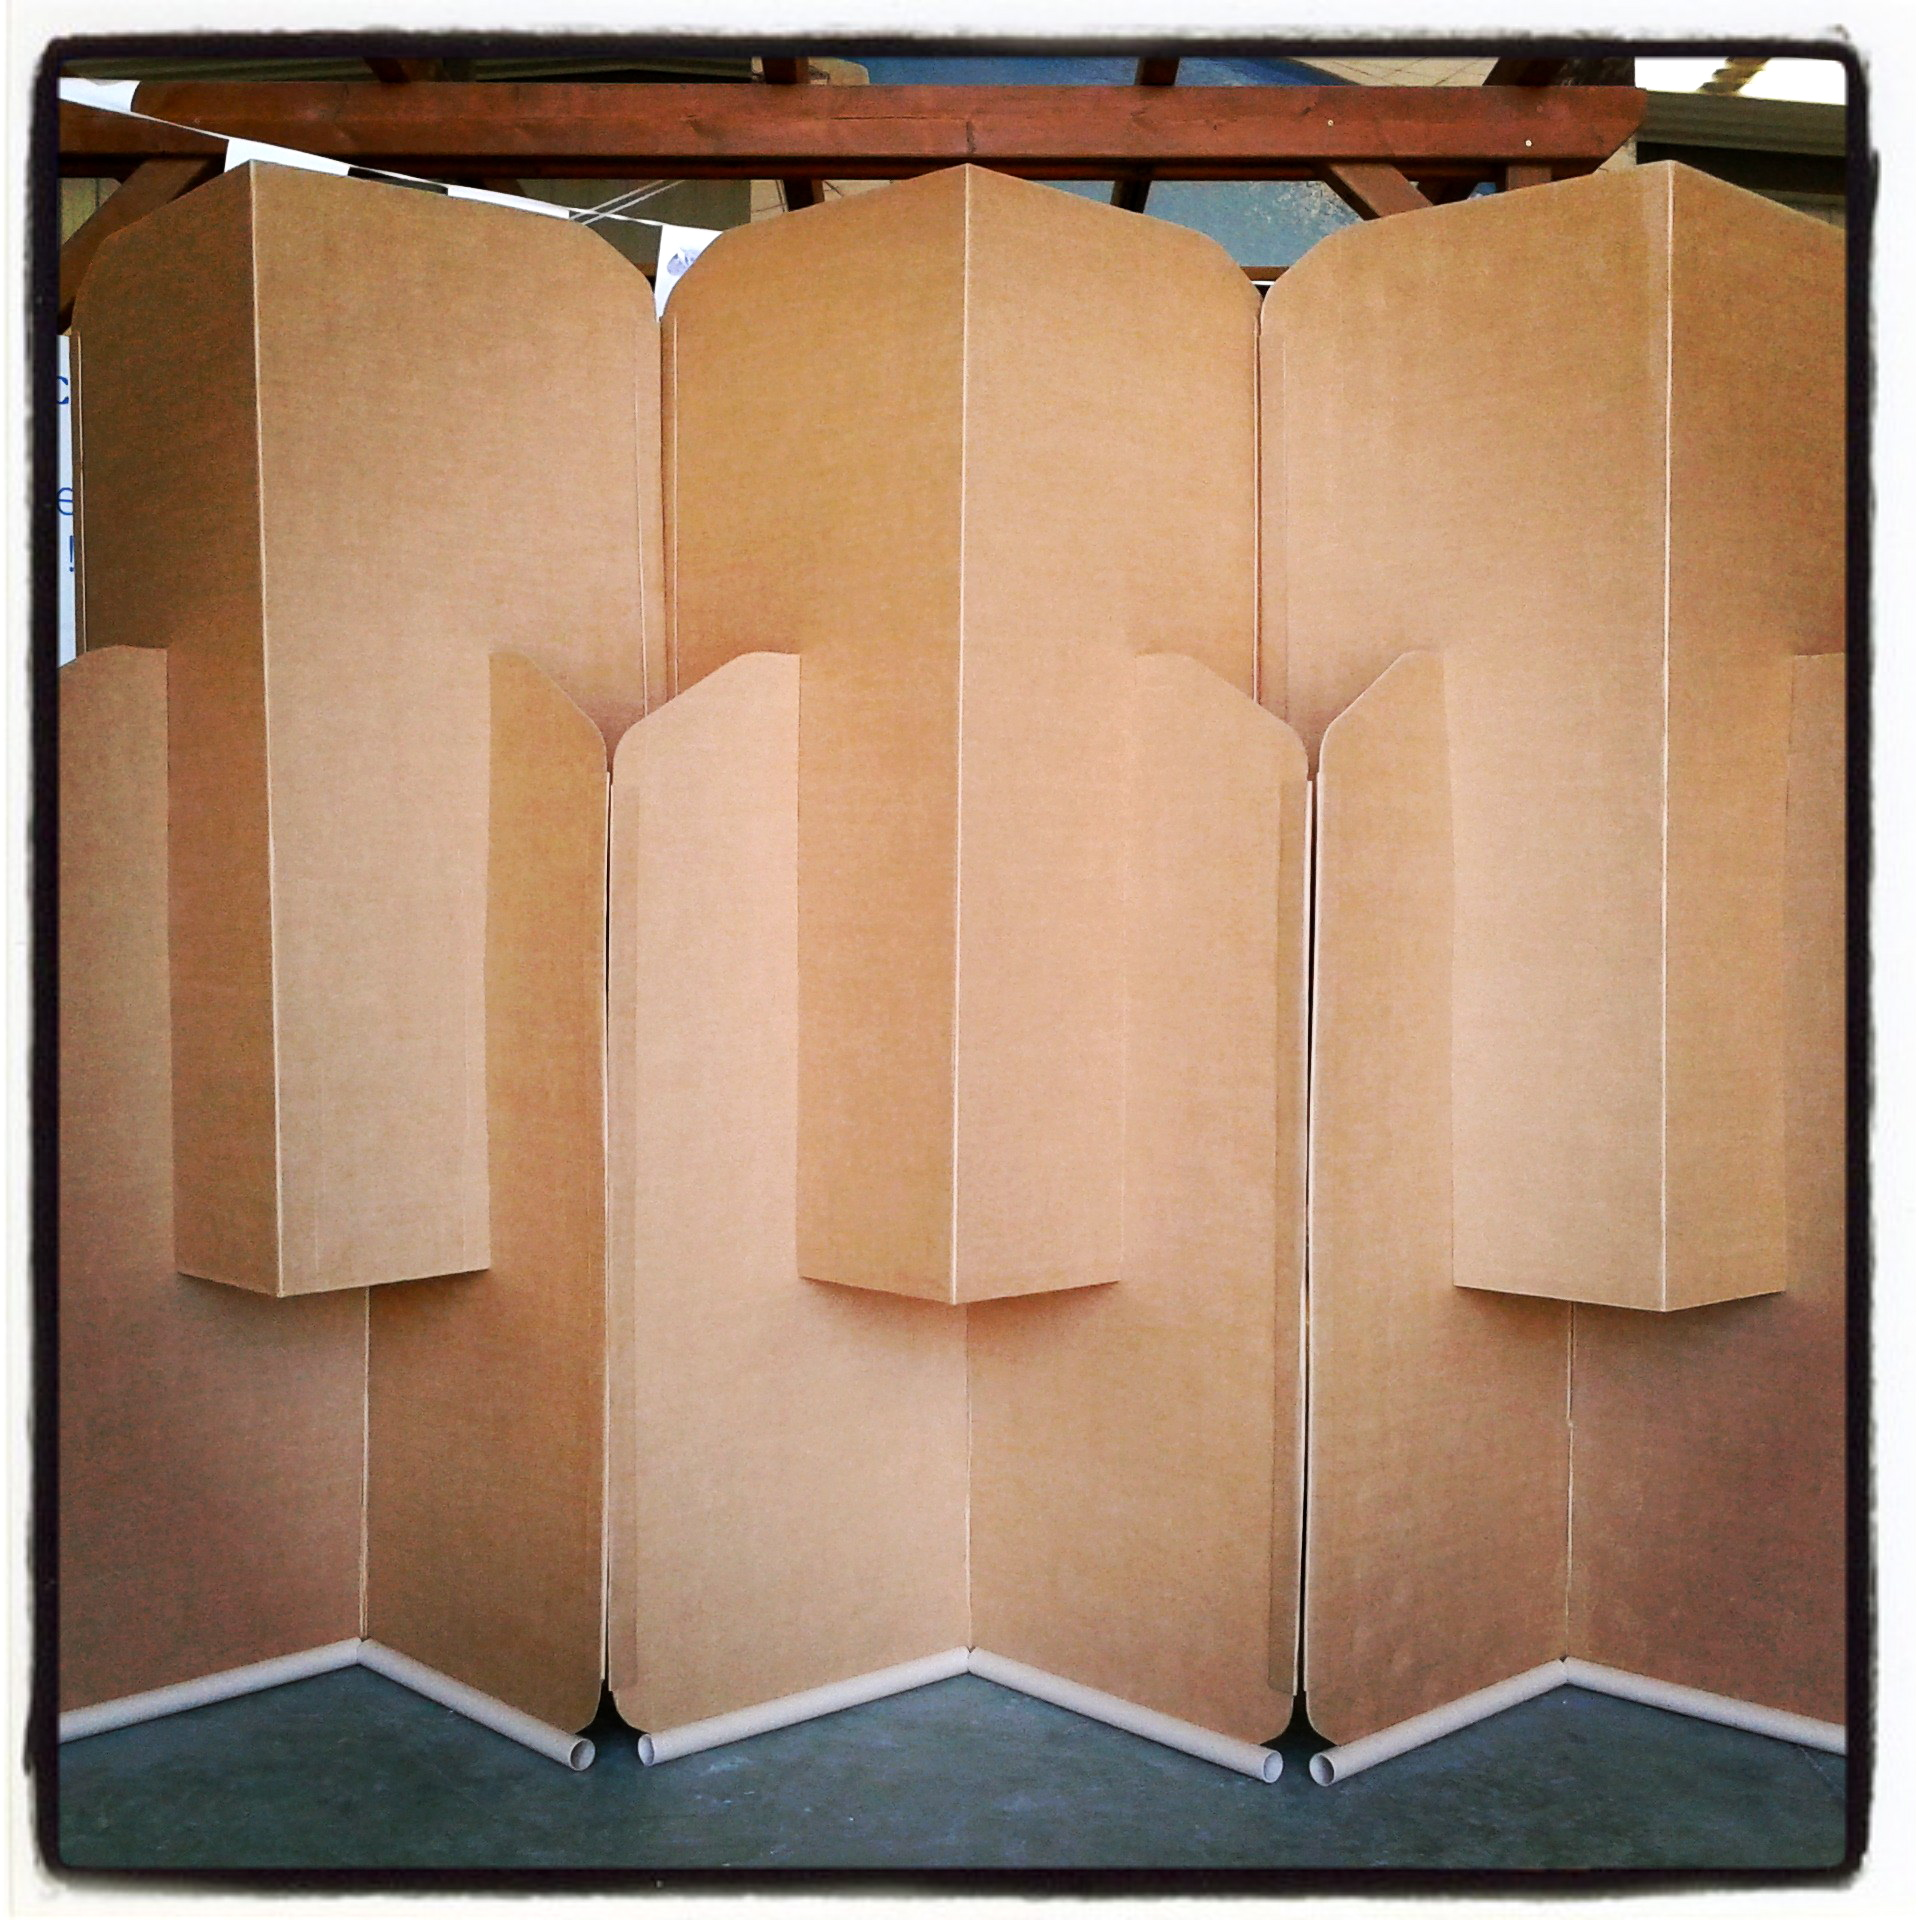 Biombo de cart n la cartoneria - Biombos de carton ...